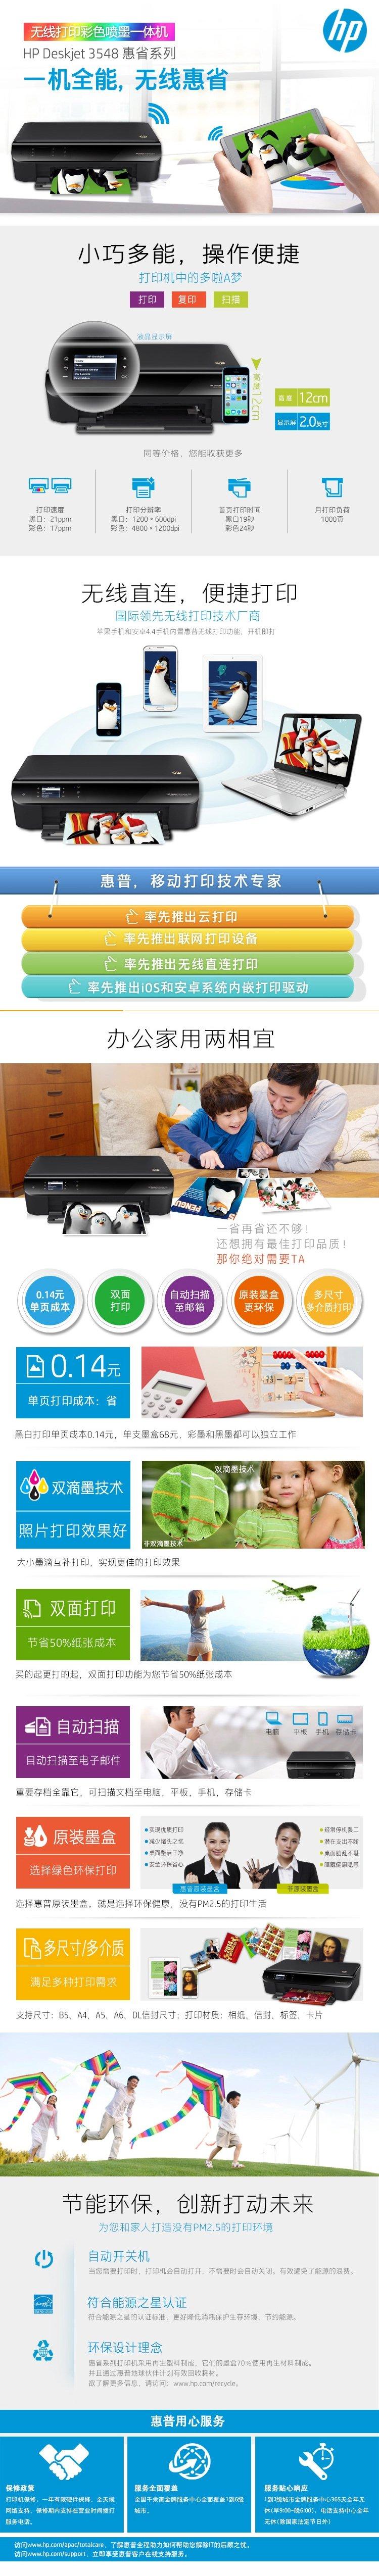 HP 惠普 Deskjet 3548 惠省系列彩色喷墨一体机